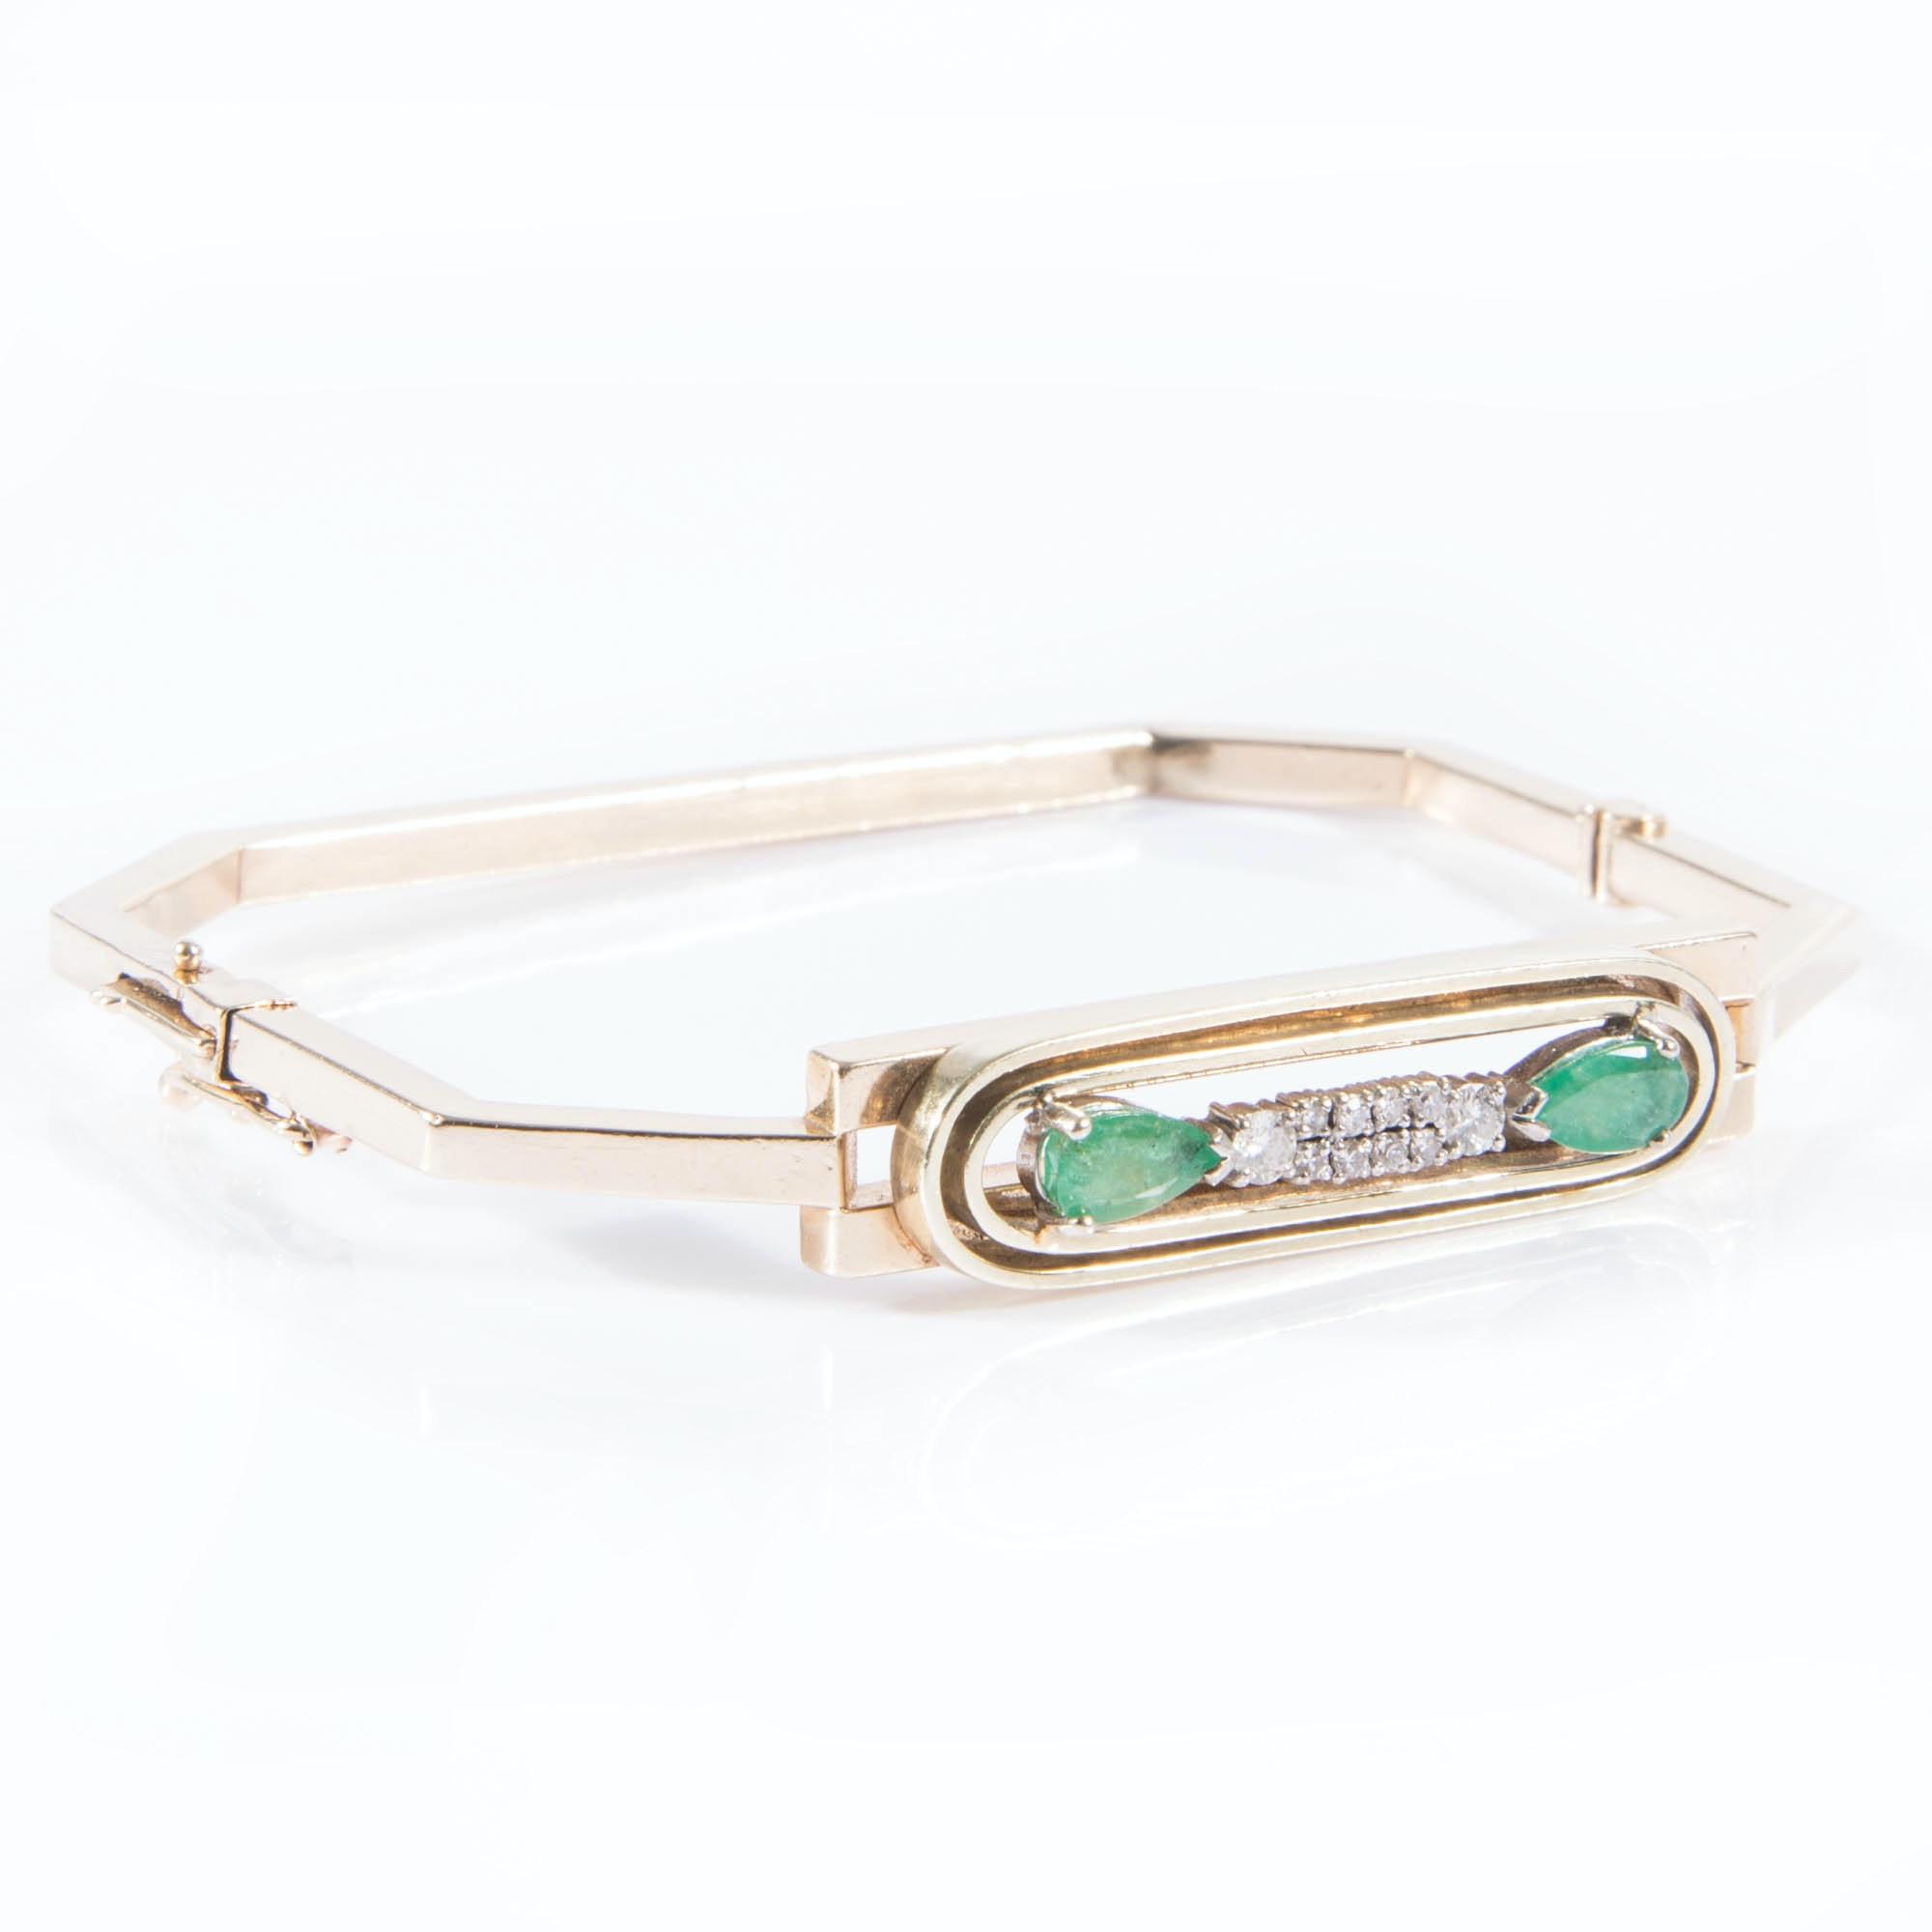 18K Gold Emerald and Diamond Bracelet